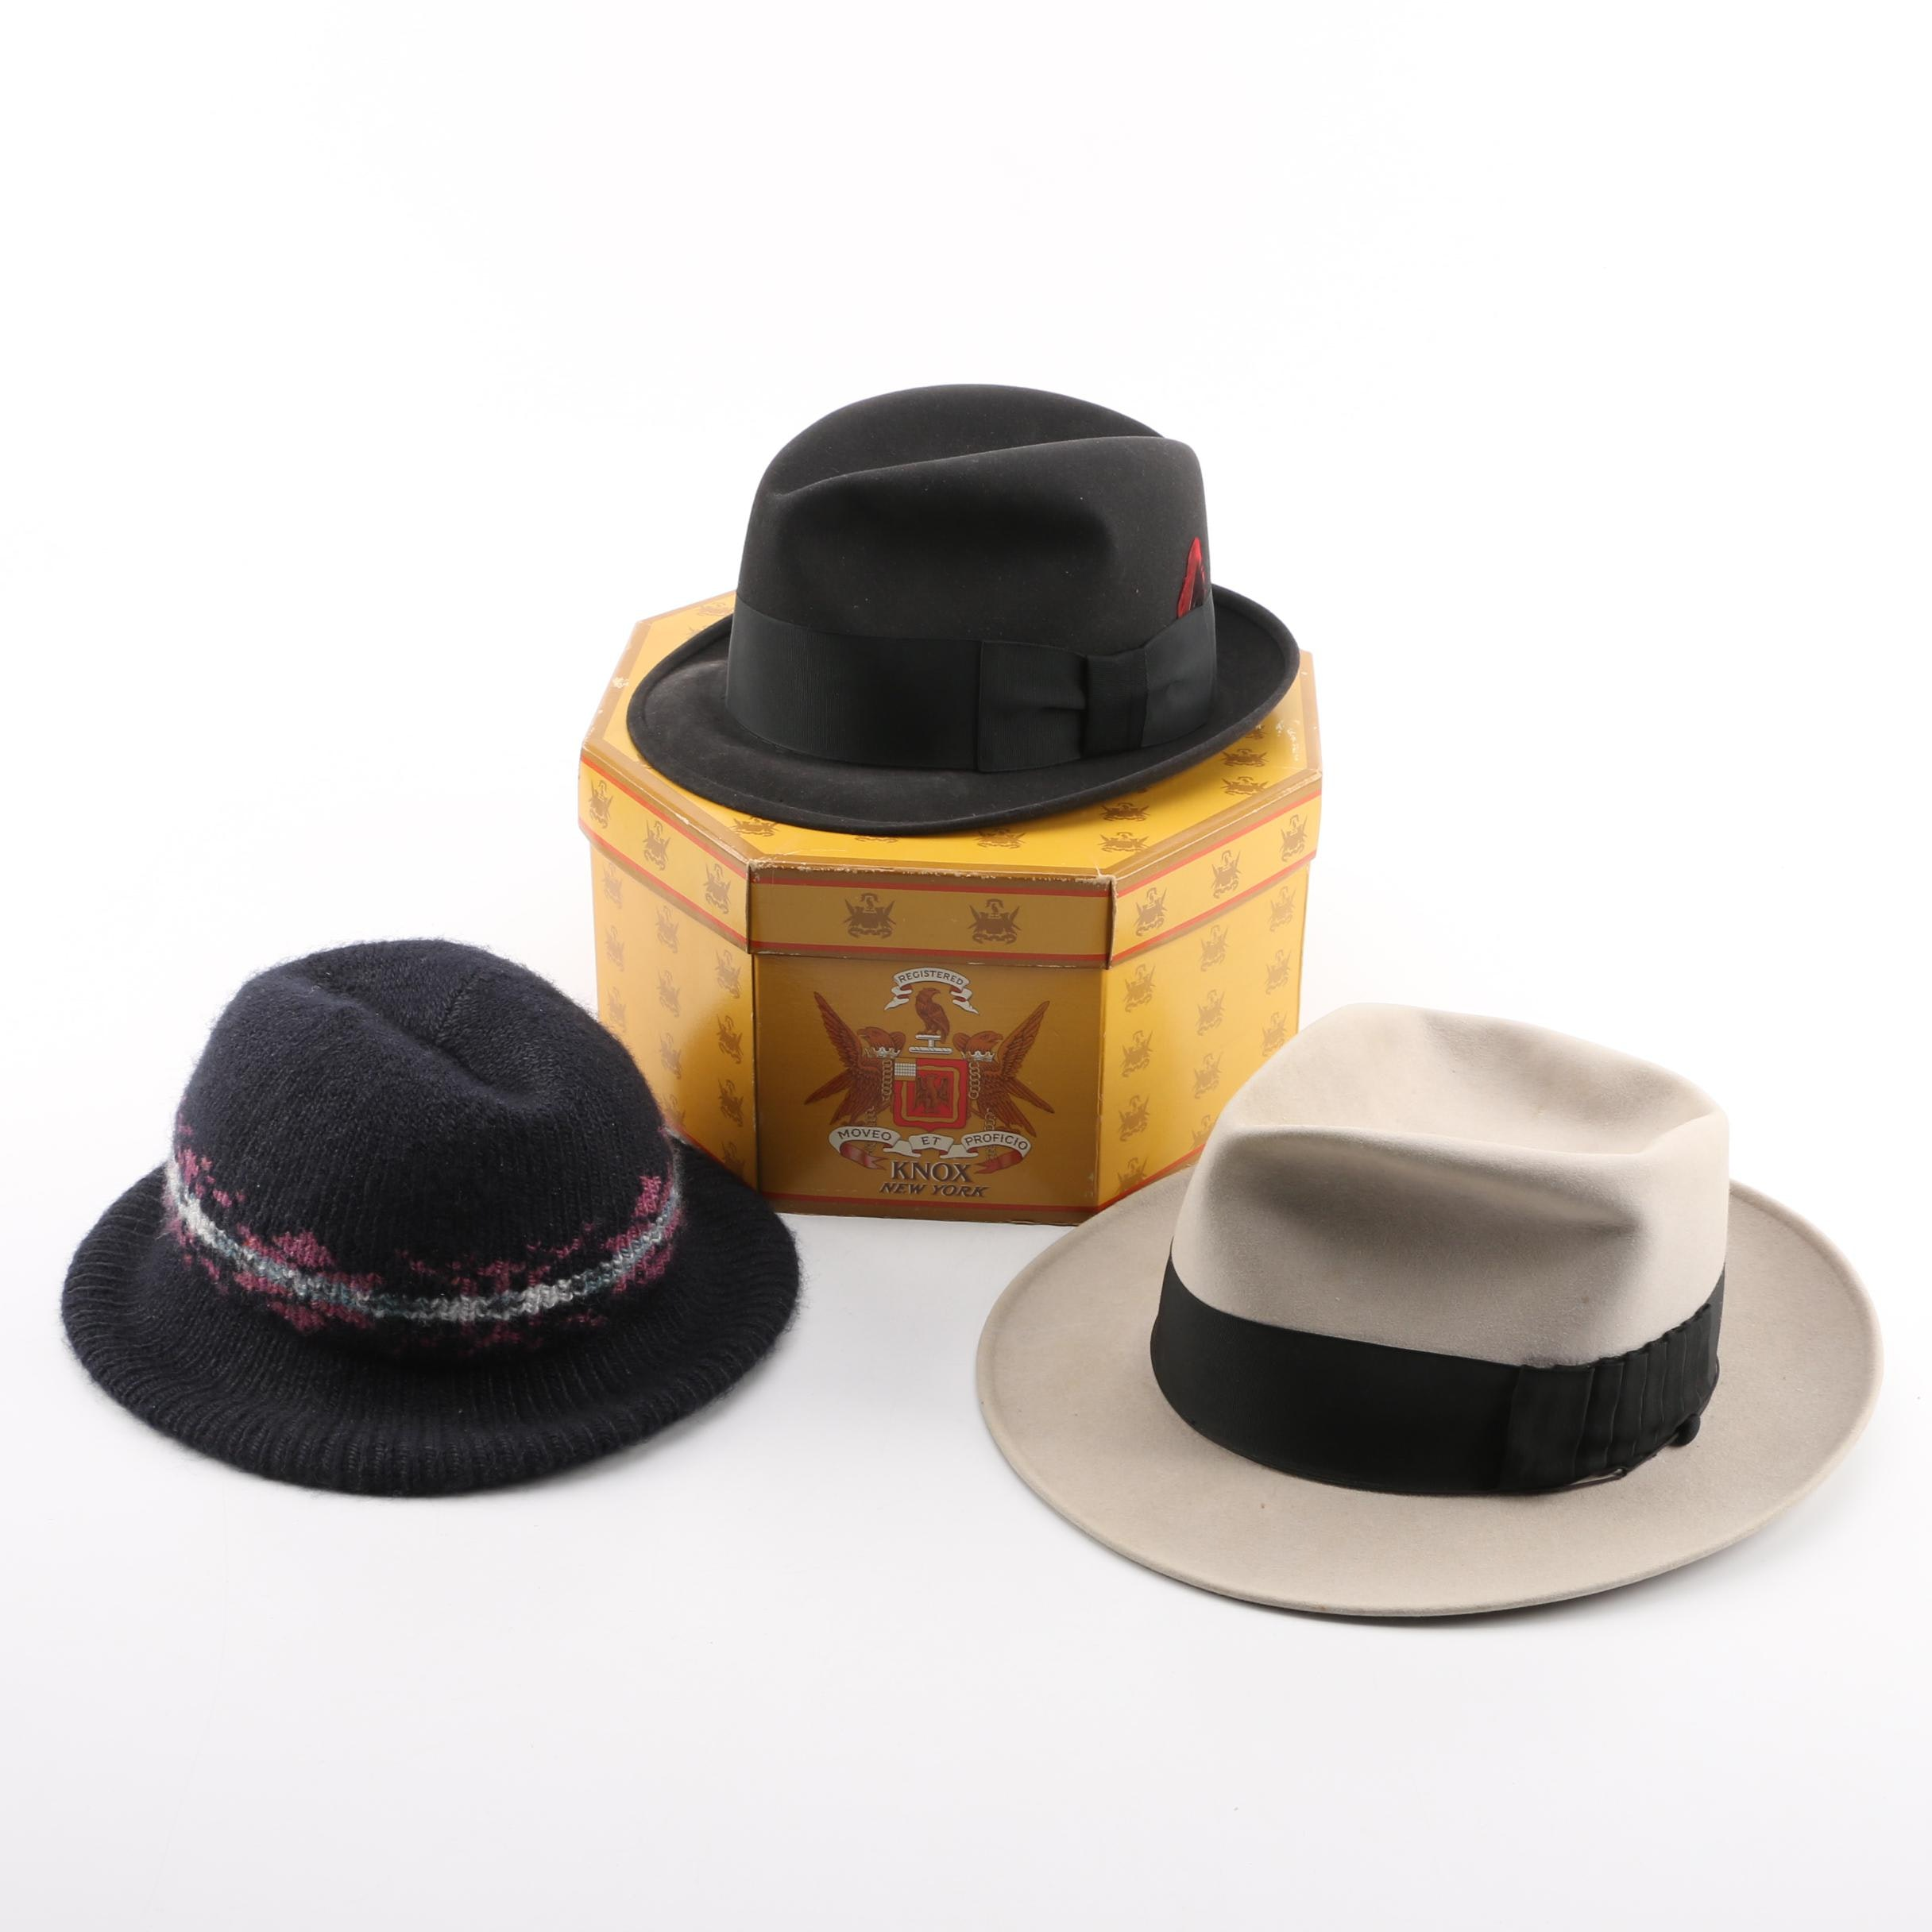 Men's Vintage Hats Including LaSalle